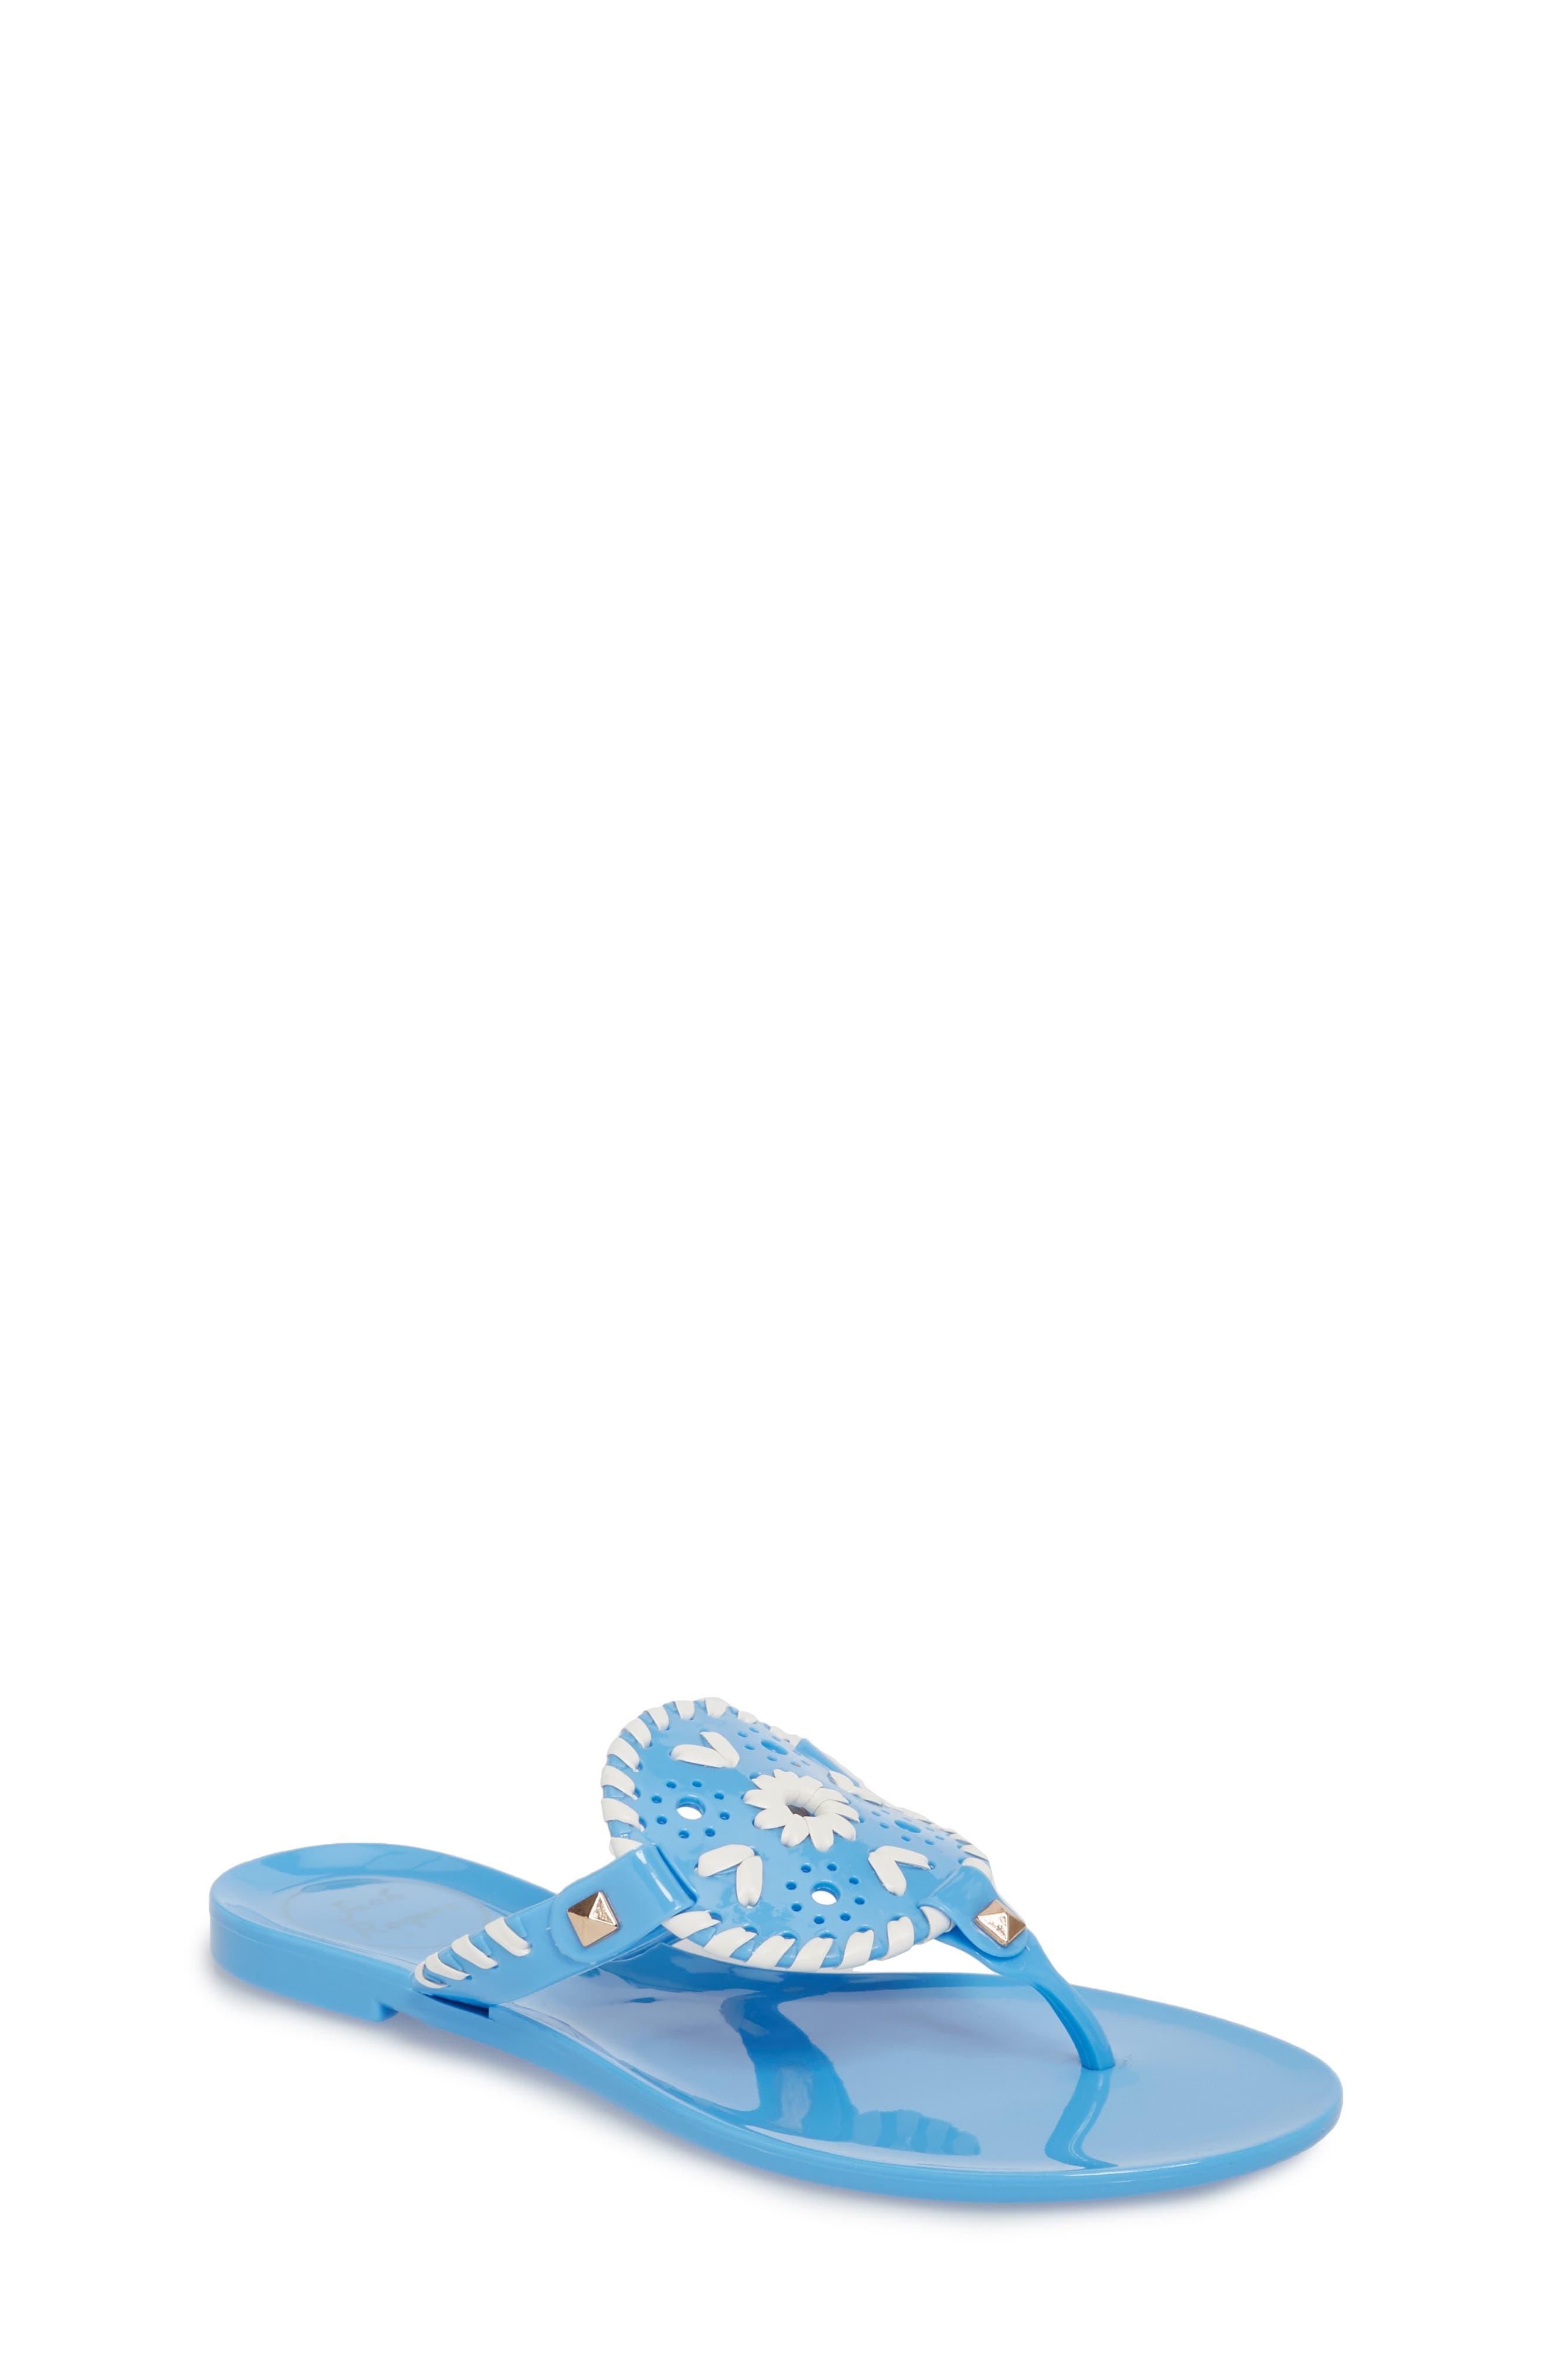 Main Image - Jack Rogers 'Miss Georgica' Jelly Flip Flop (Walker, Toddler, Little Kid & Big Kid)